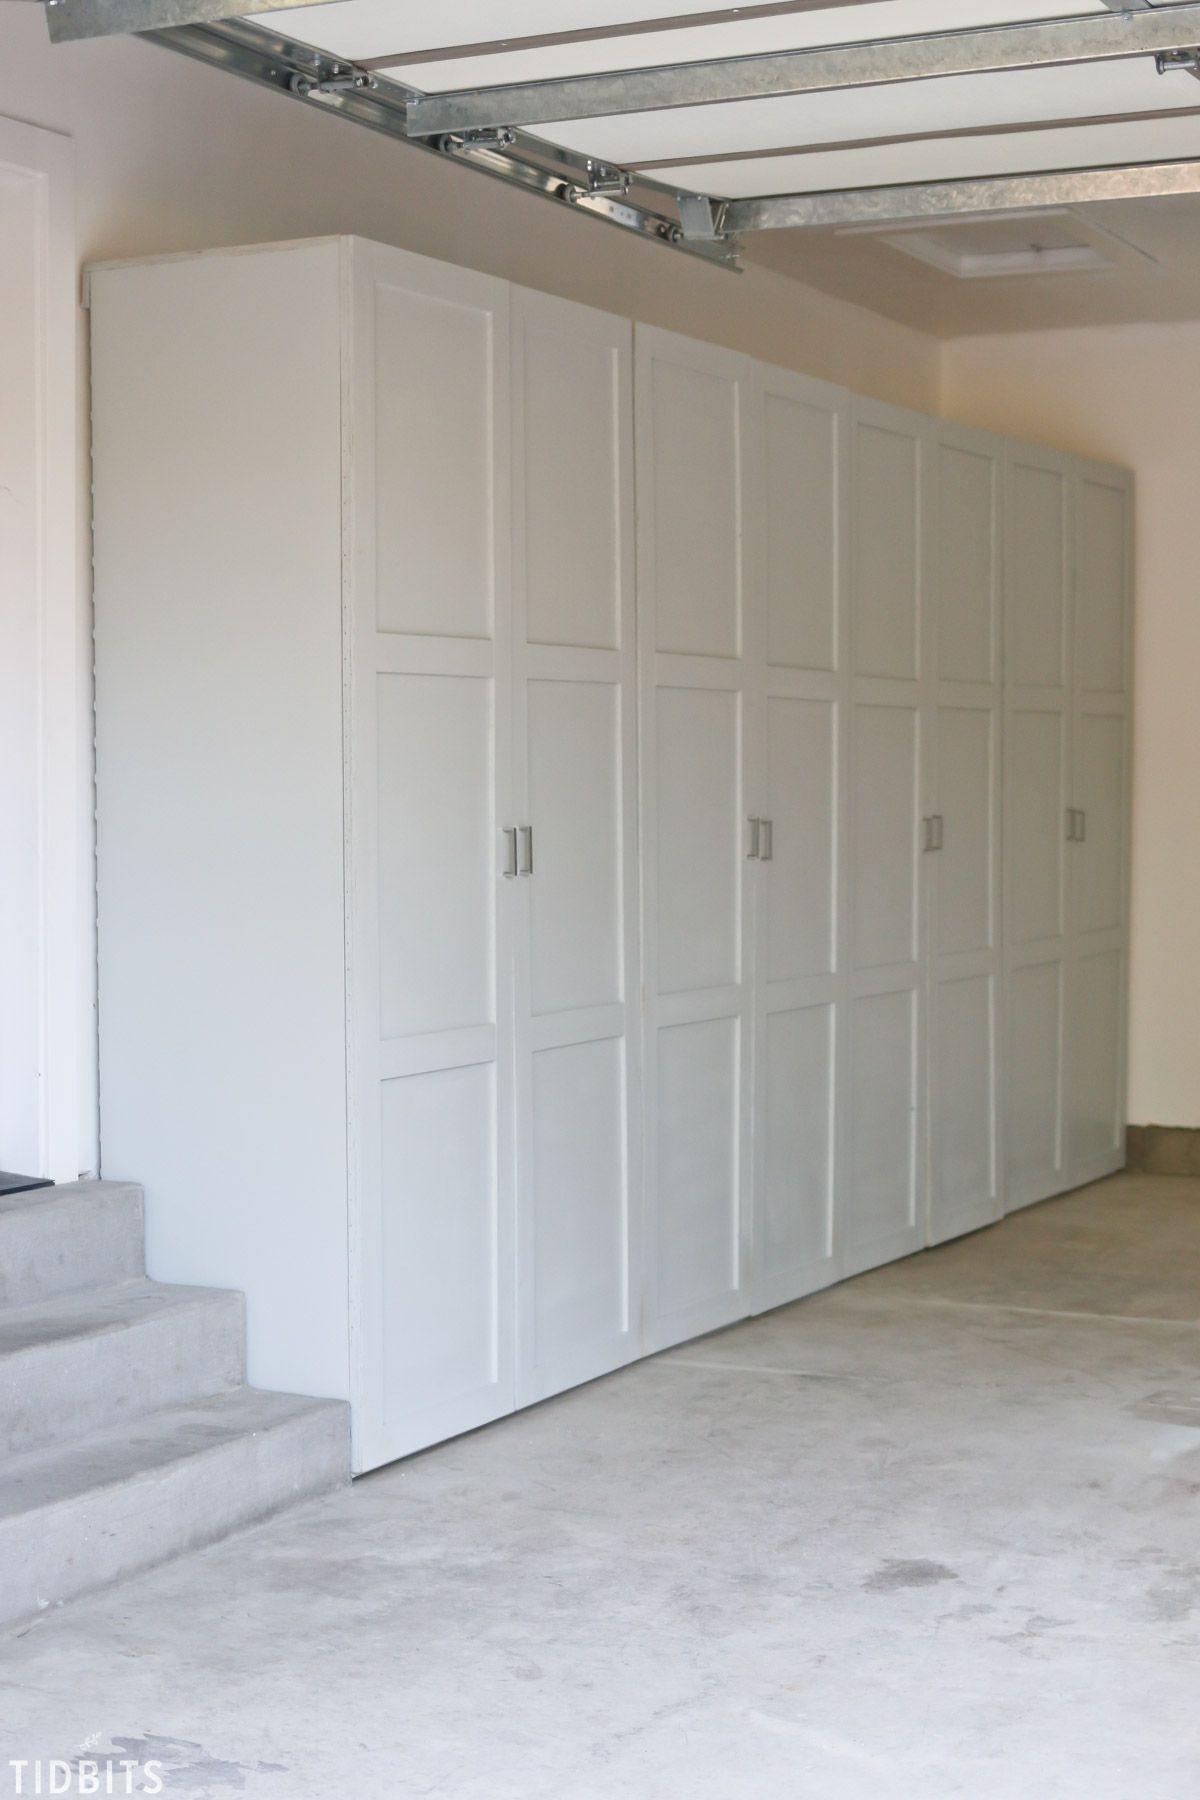 Photo of Garage Storage Cabinets | Free Building Plans – Tidbits #garageideas Think the o…